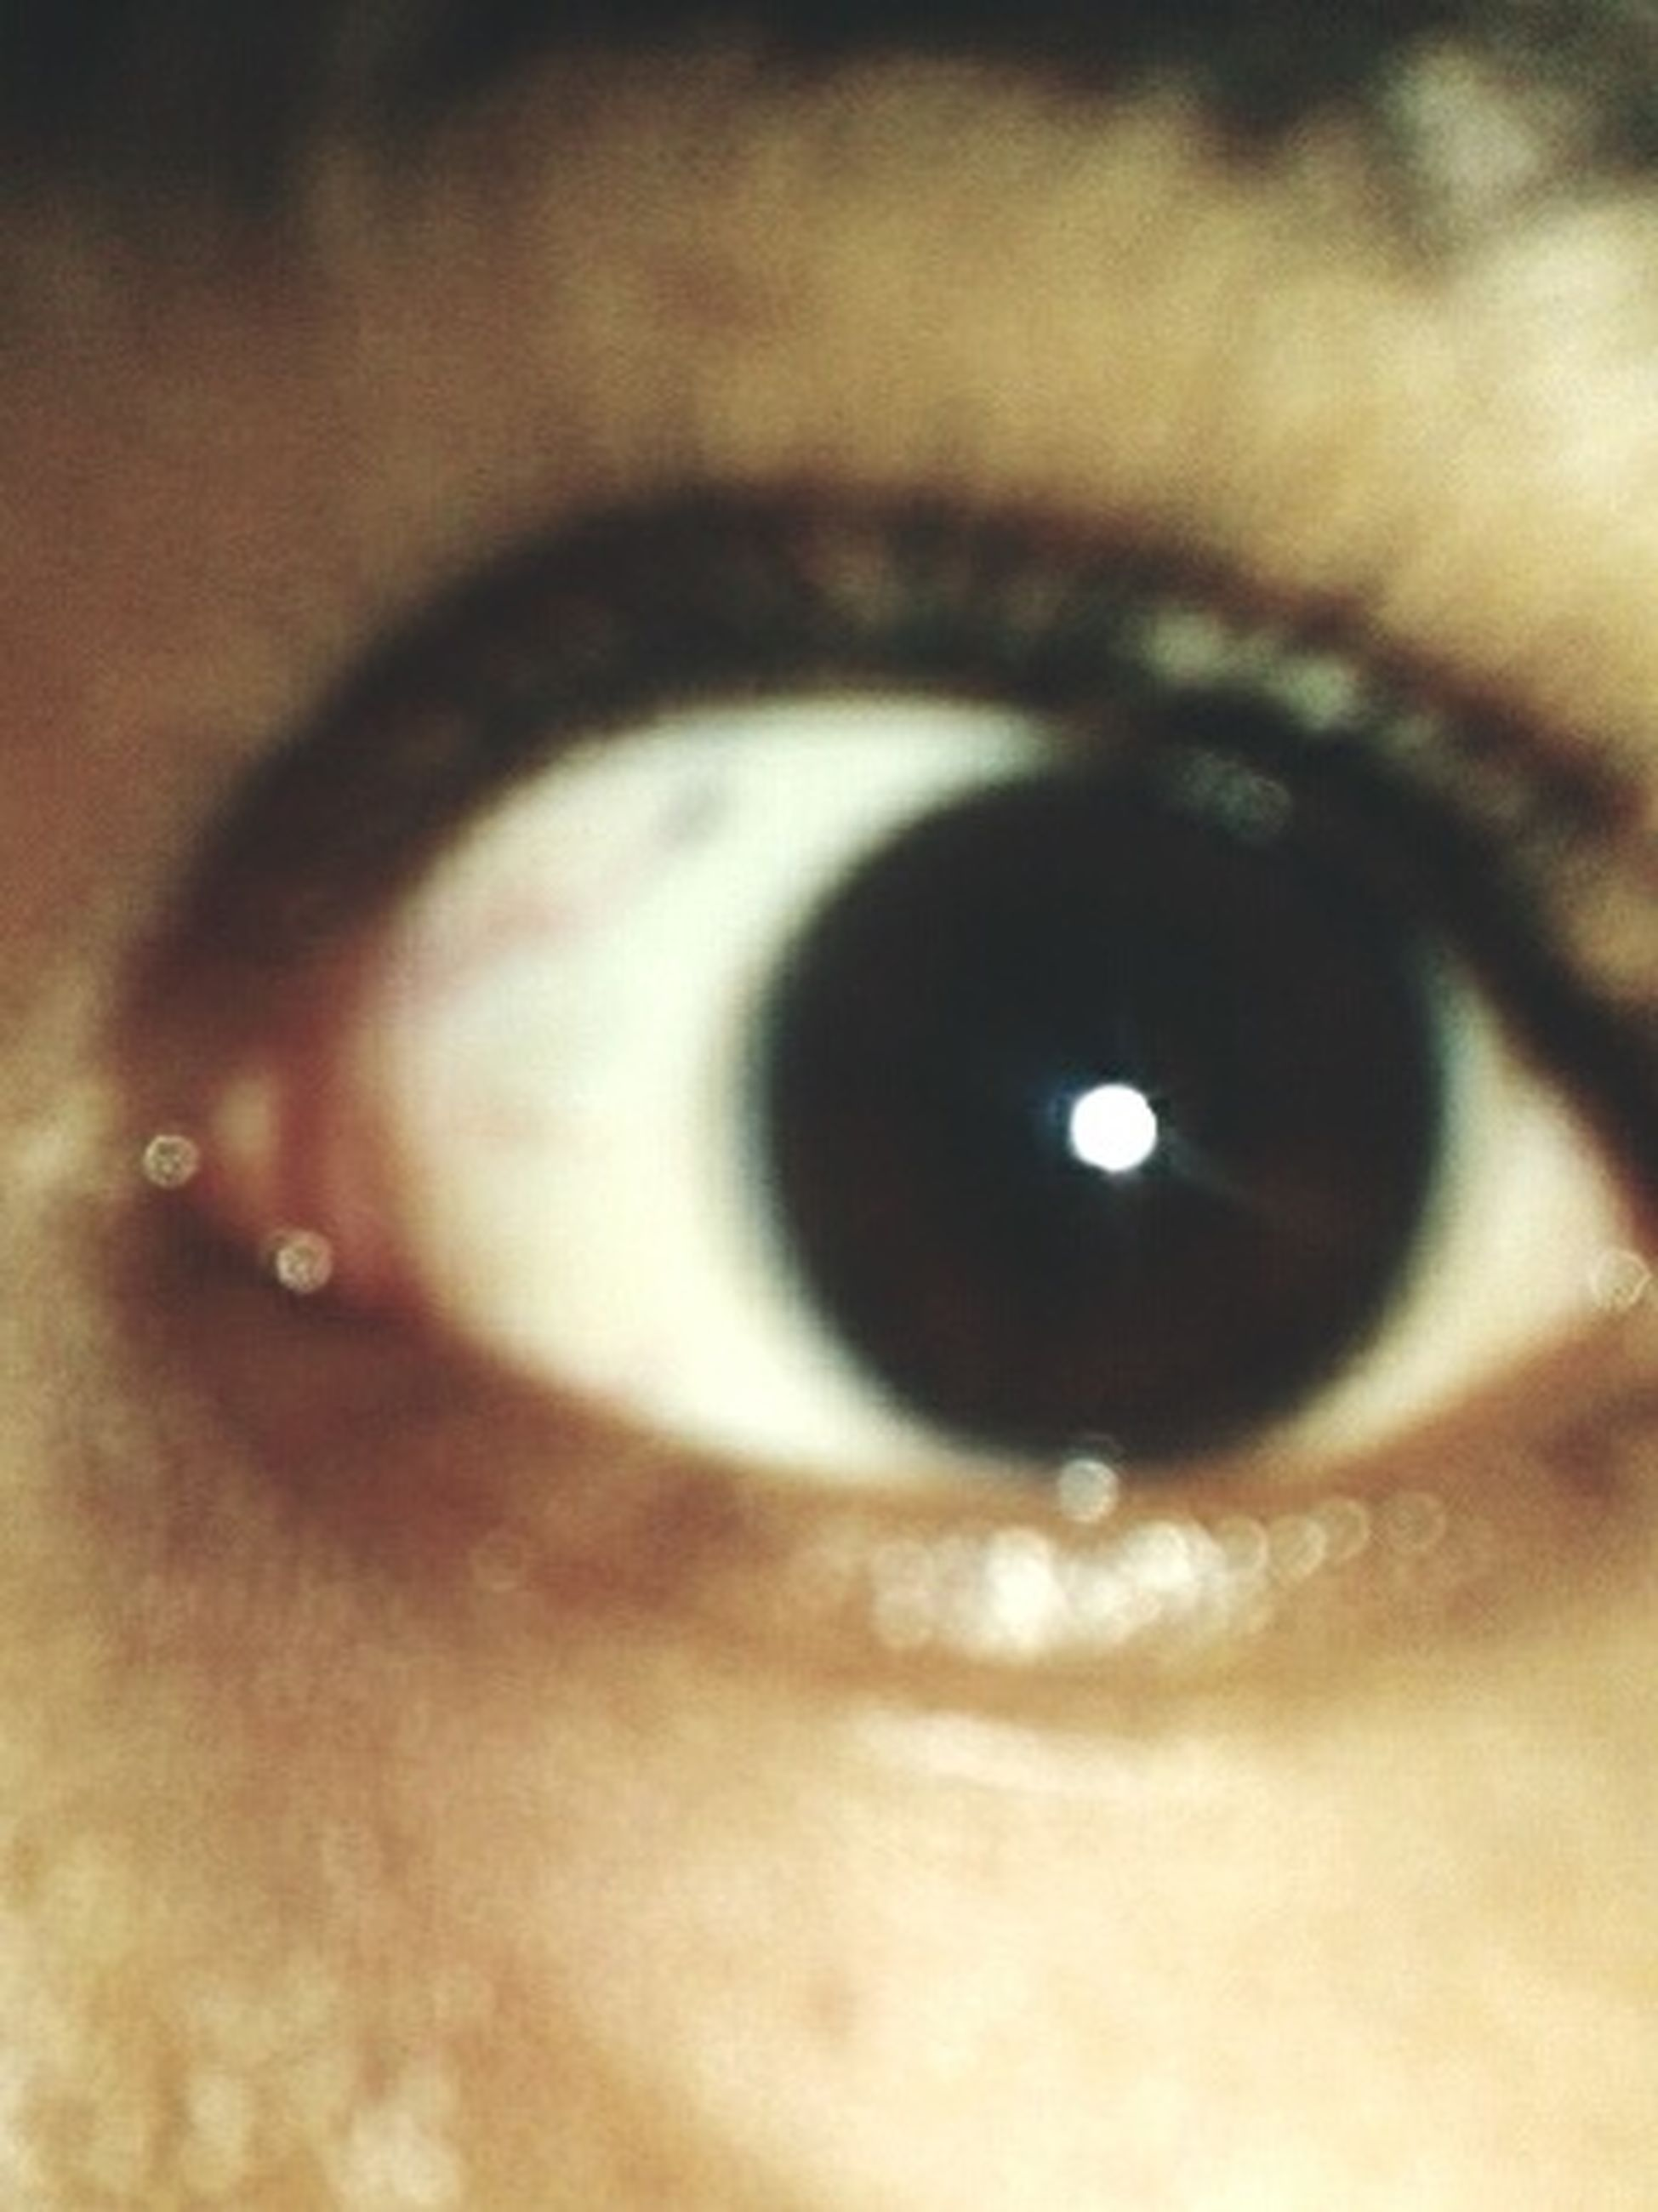 close-up, human eye, indoors, eyelash, eyesight, extreme close-up, part of, sensory perception, circle, reflection, selective focus, extreme close up, unrecognizable person, iris - eye, human skin, detail, eyeball